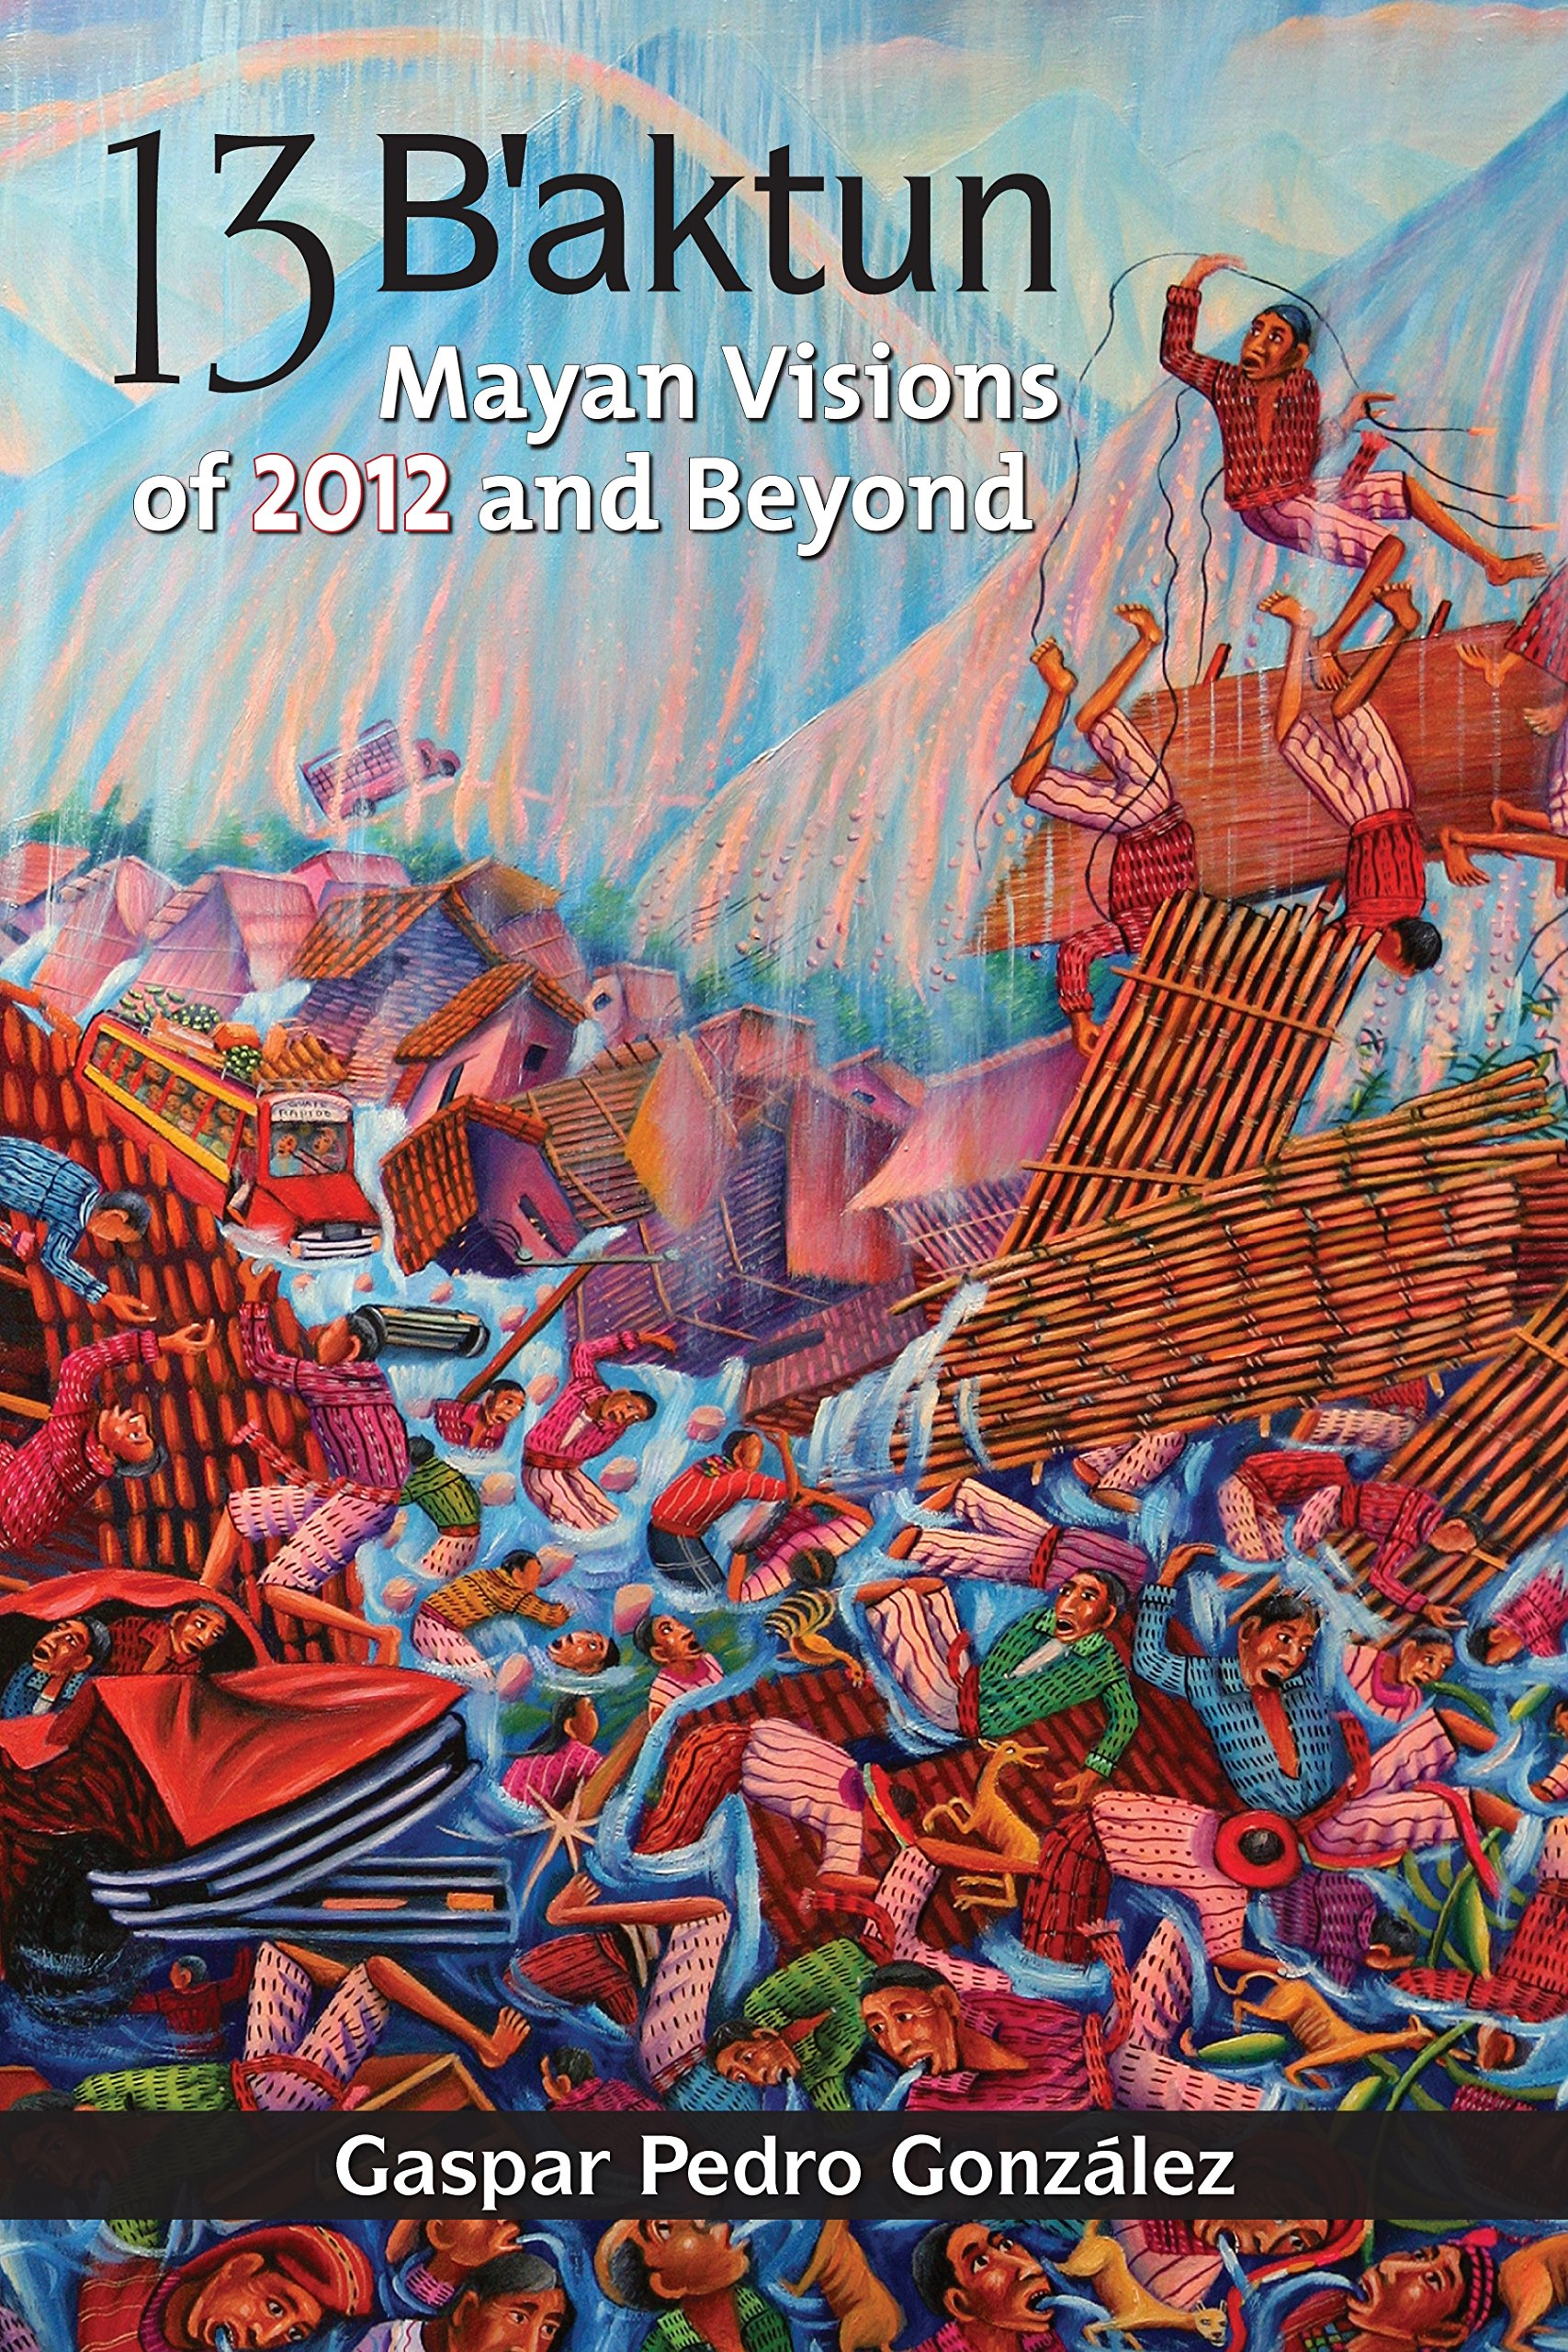 13-b-aktun-mayan-visions-of-2012-and-beyond